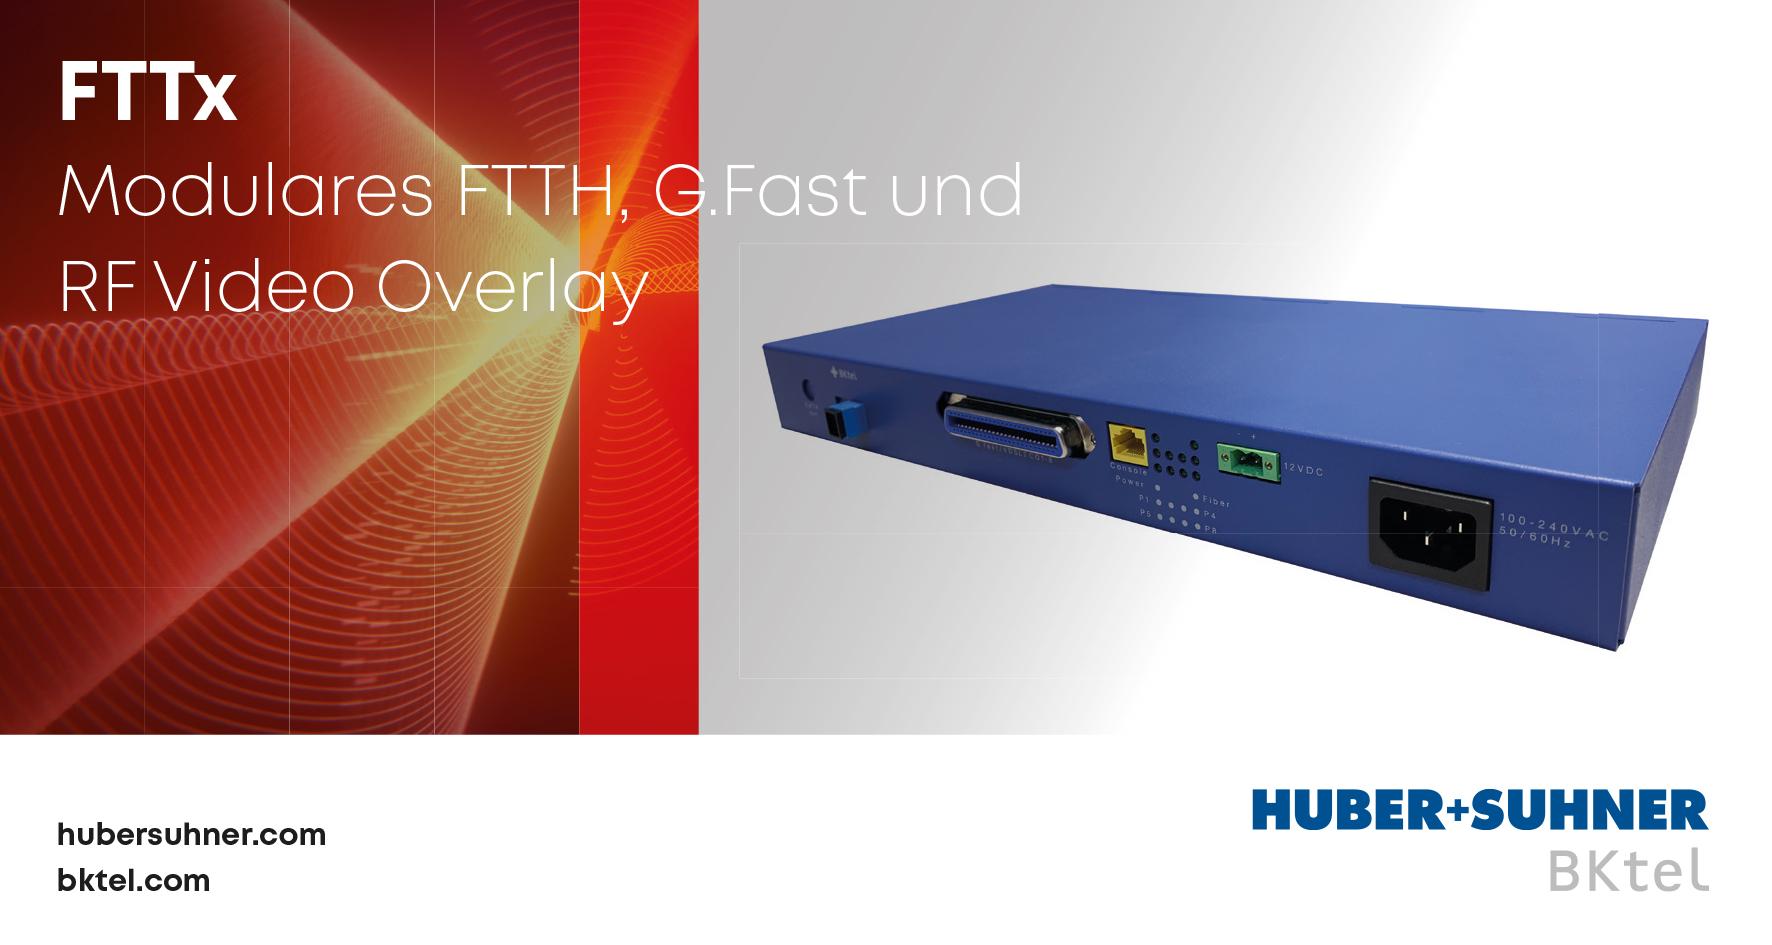 Modulares FTTH, G.fast und RF Video oberlay